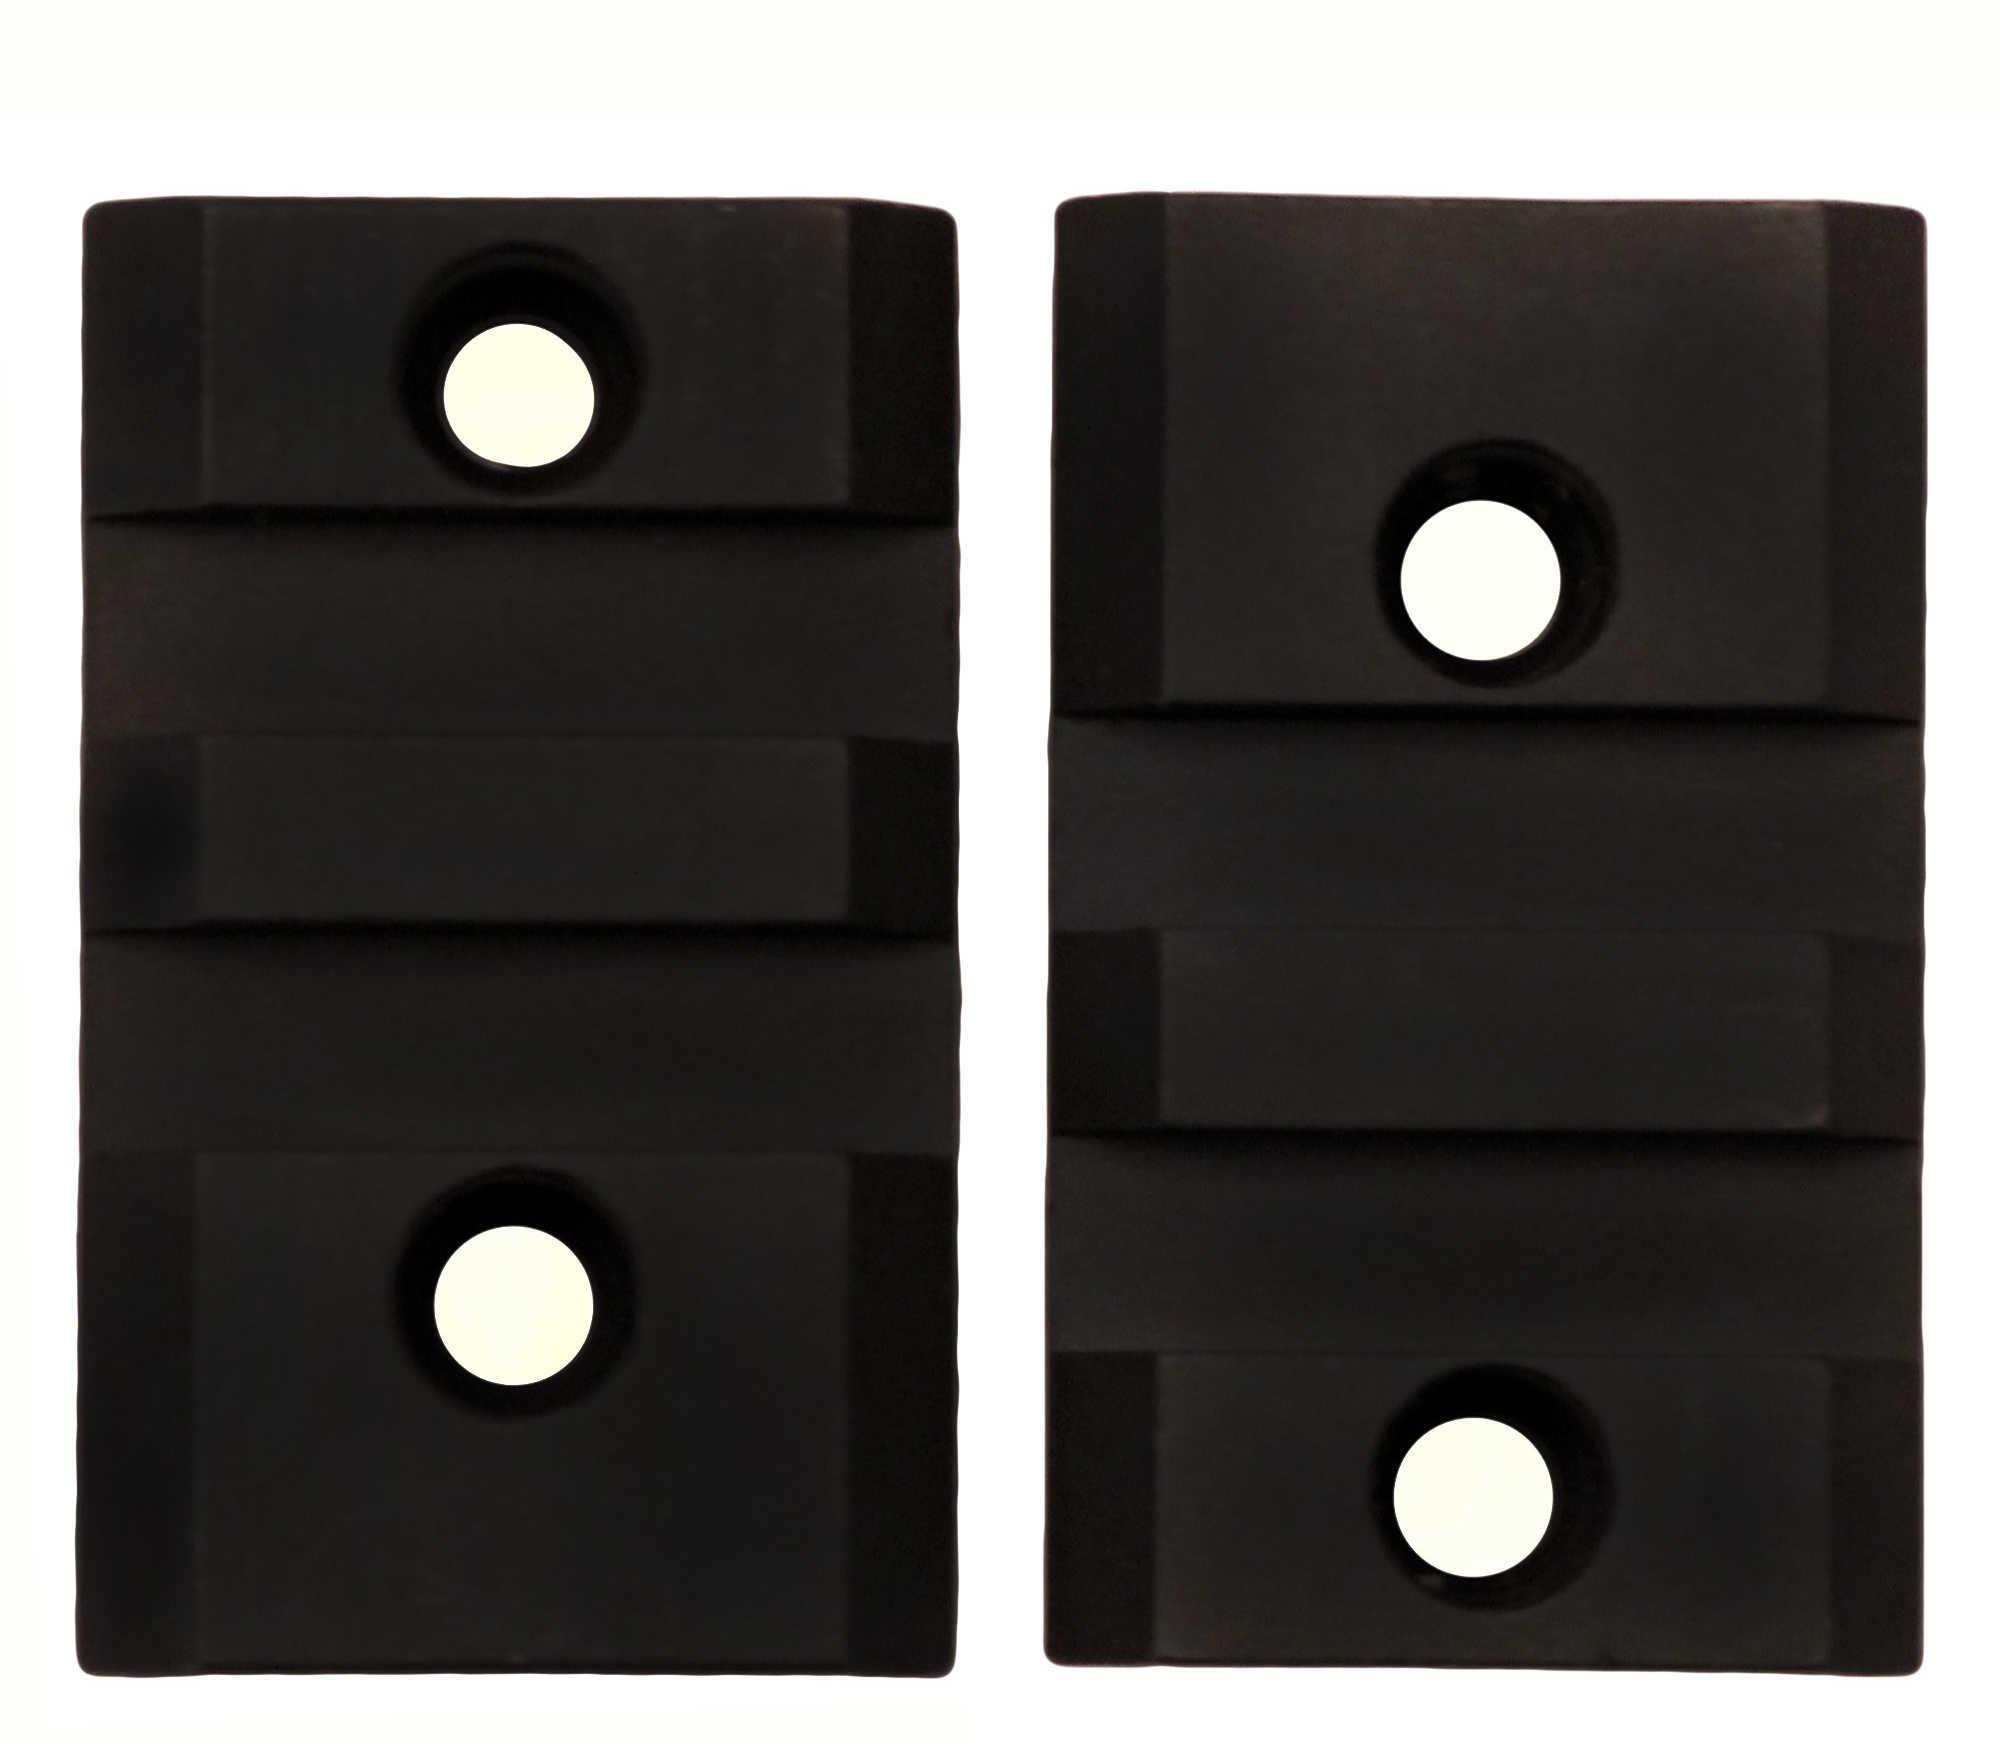 Burris XTB Weaver-Style Solid Steel Bases Tikka, 2 Piece, Matte Black Md: 410630